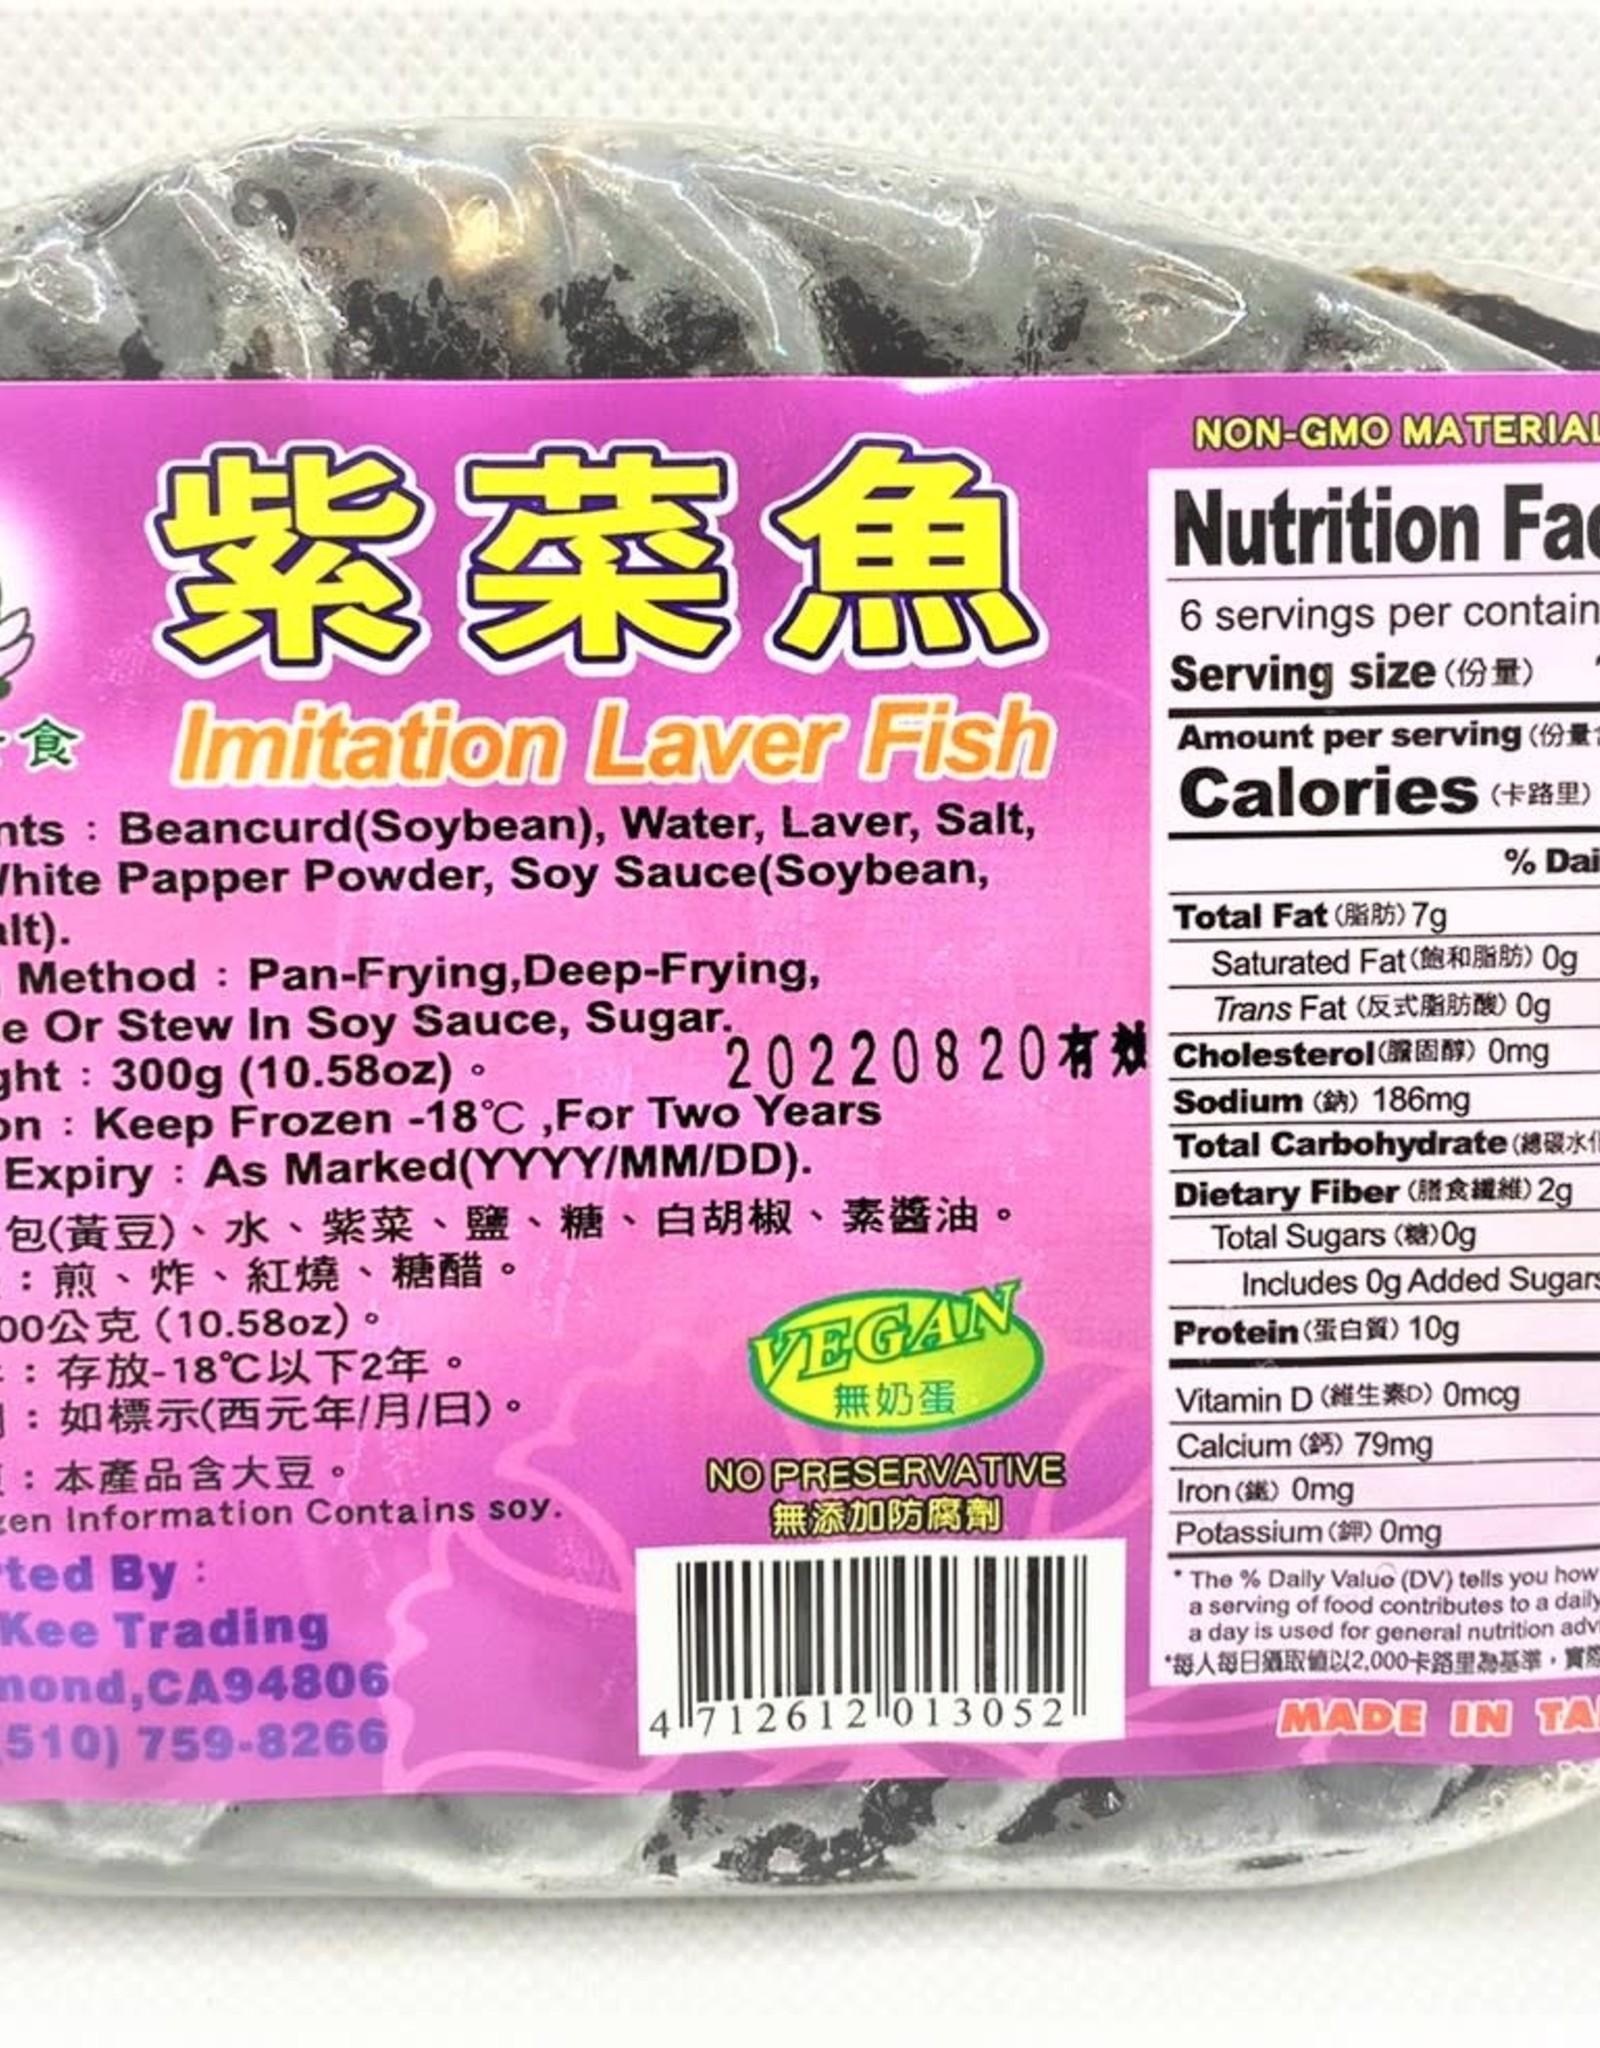 Yang Kee * 楊記 (YK) Vegan Laver Fish*(楊記) 全素紫菜魚